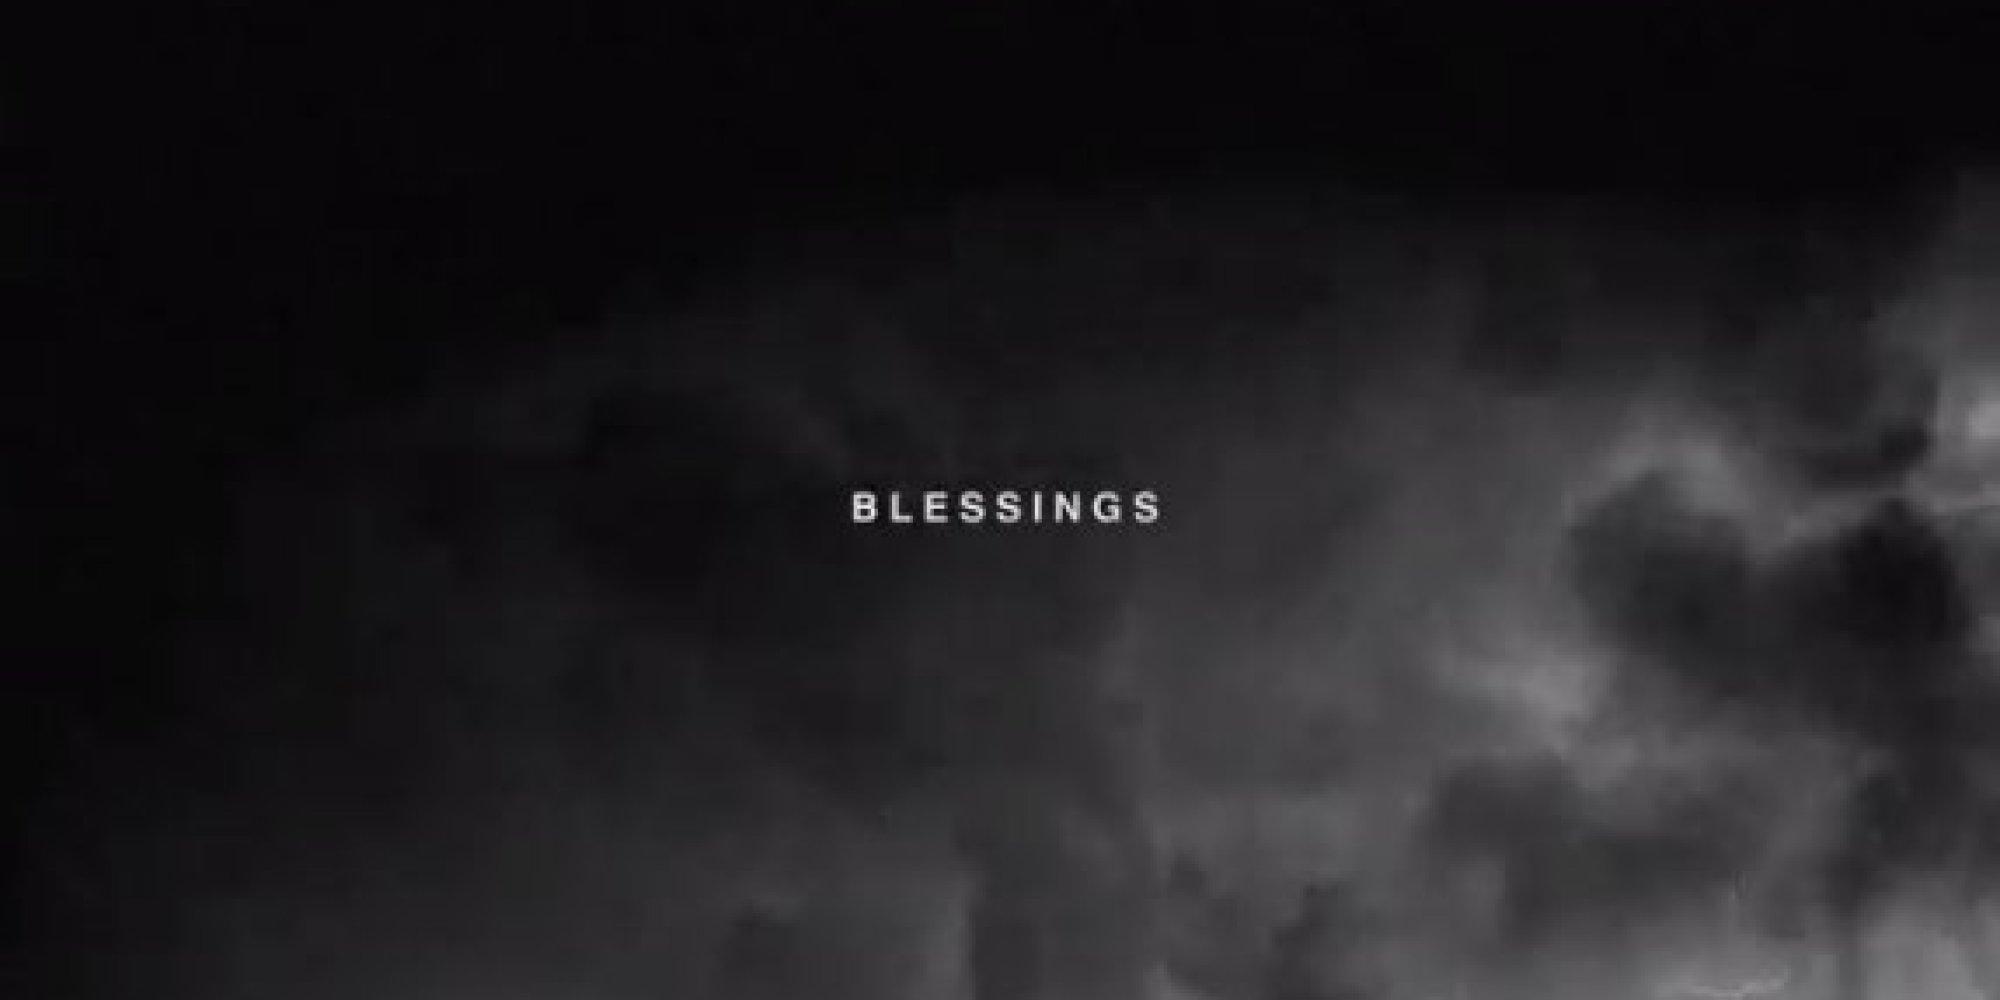 blessing black singles Blackchristianpeoplemeetcom is the premier online black christian dating service black christian singles are online now in our large black christian people meet.